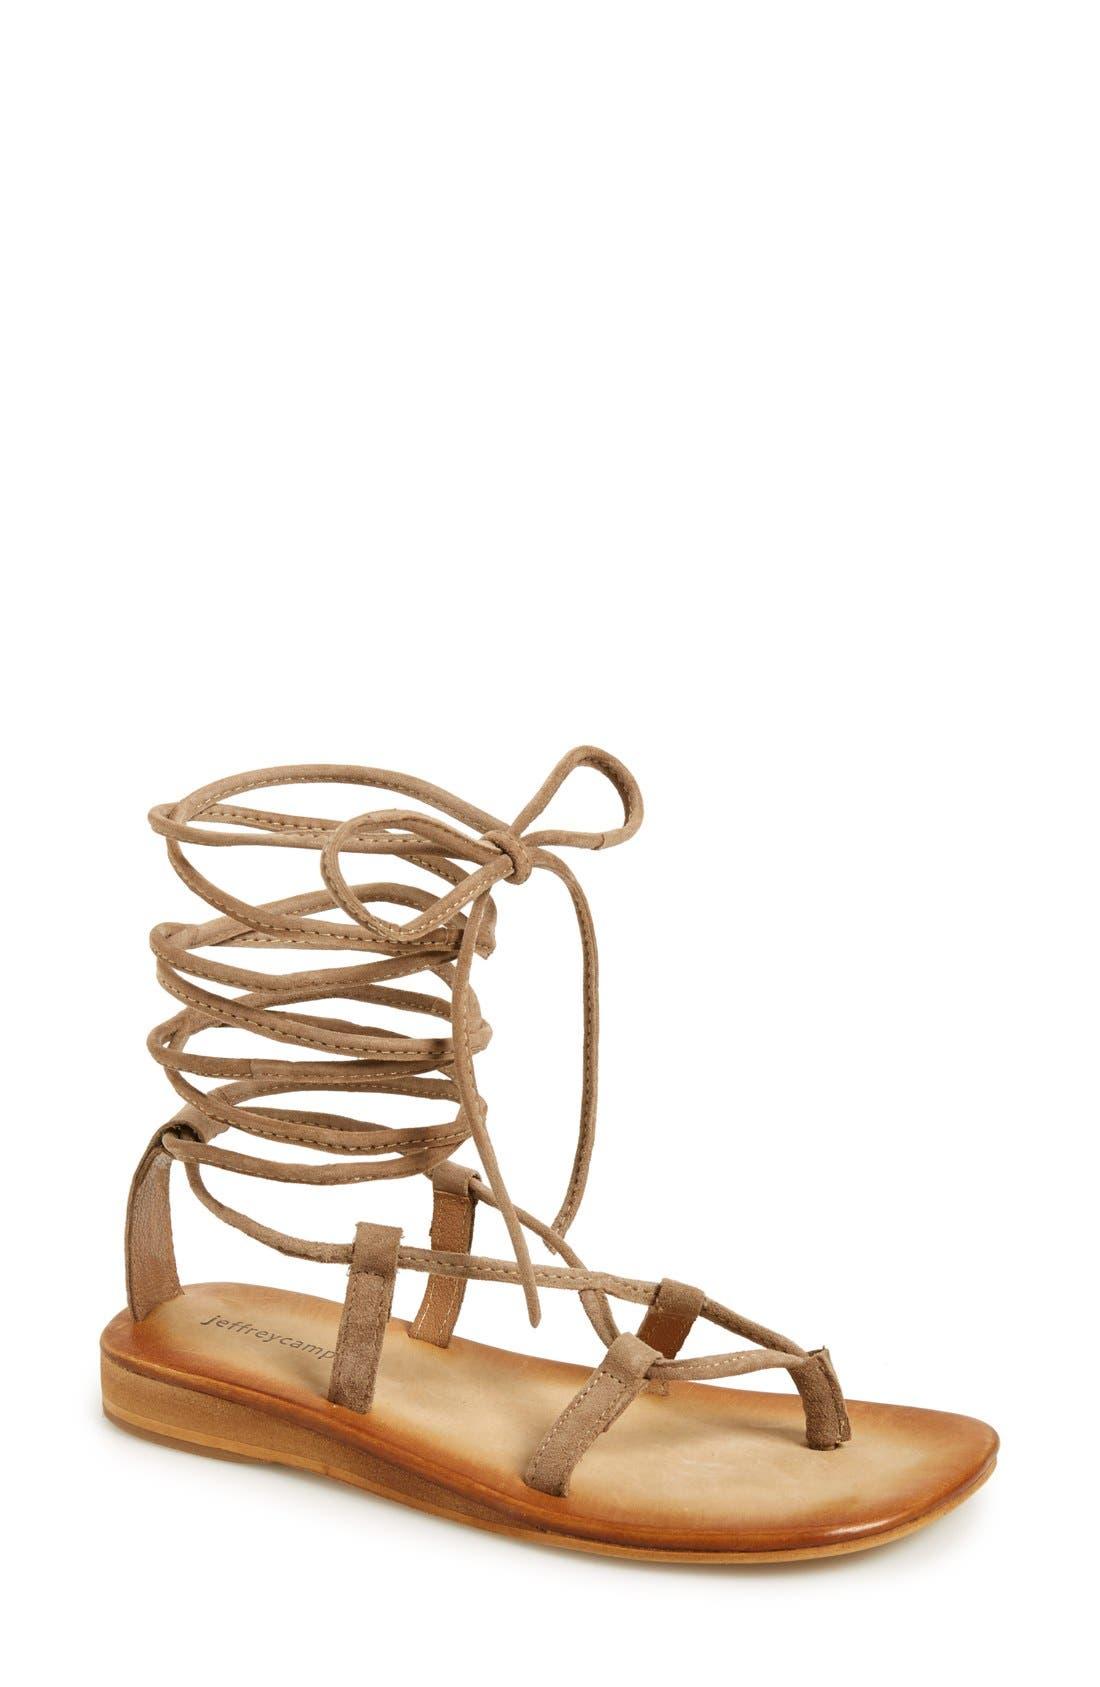 Main Image - Jeffrey Campbell 'Lima' Wraparound Strap Sandal (Women)